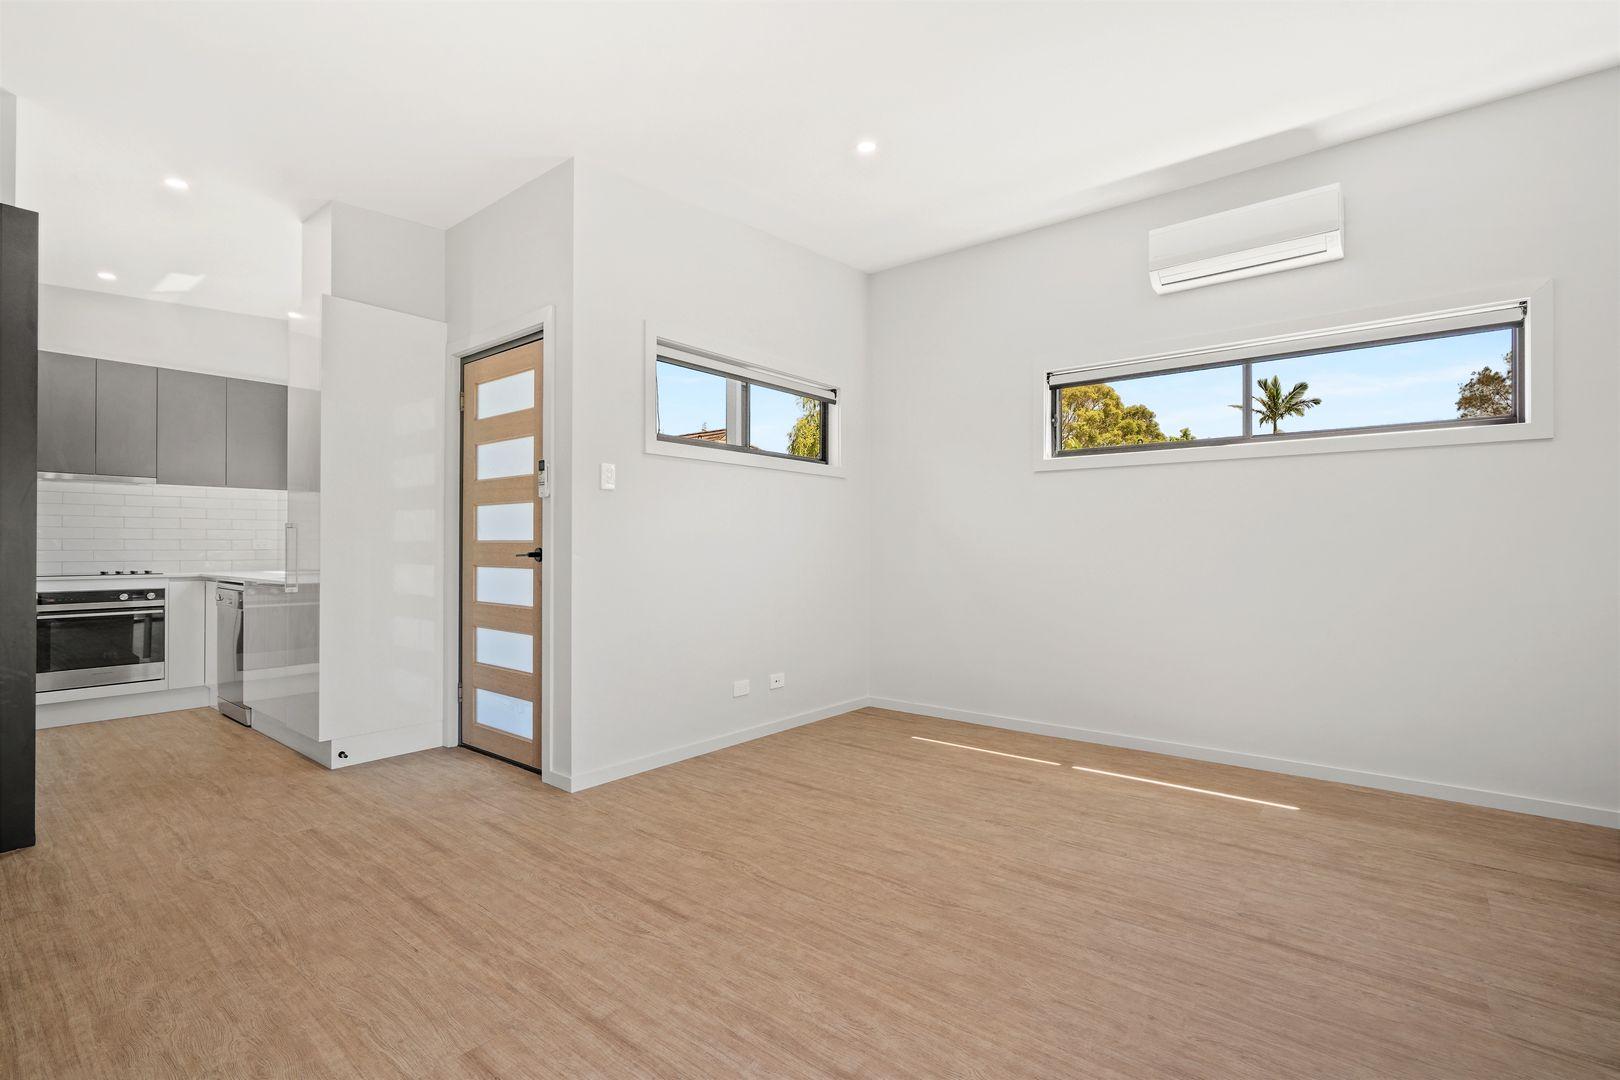 19a Mundoora Ave, Yattalunga NSW 2251, Image 1